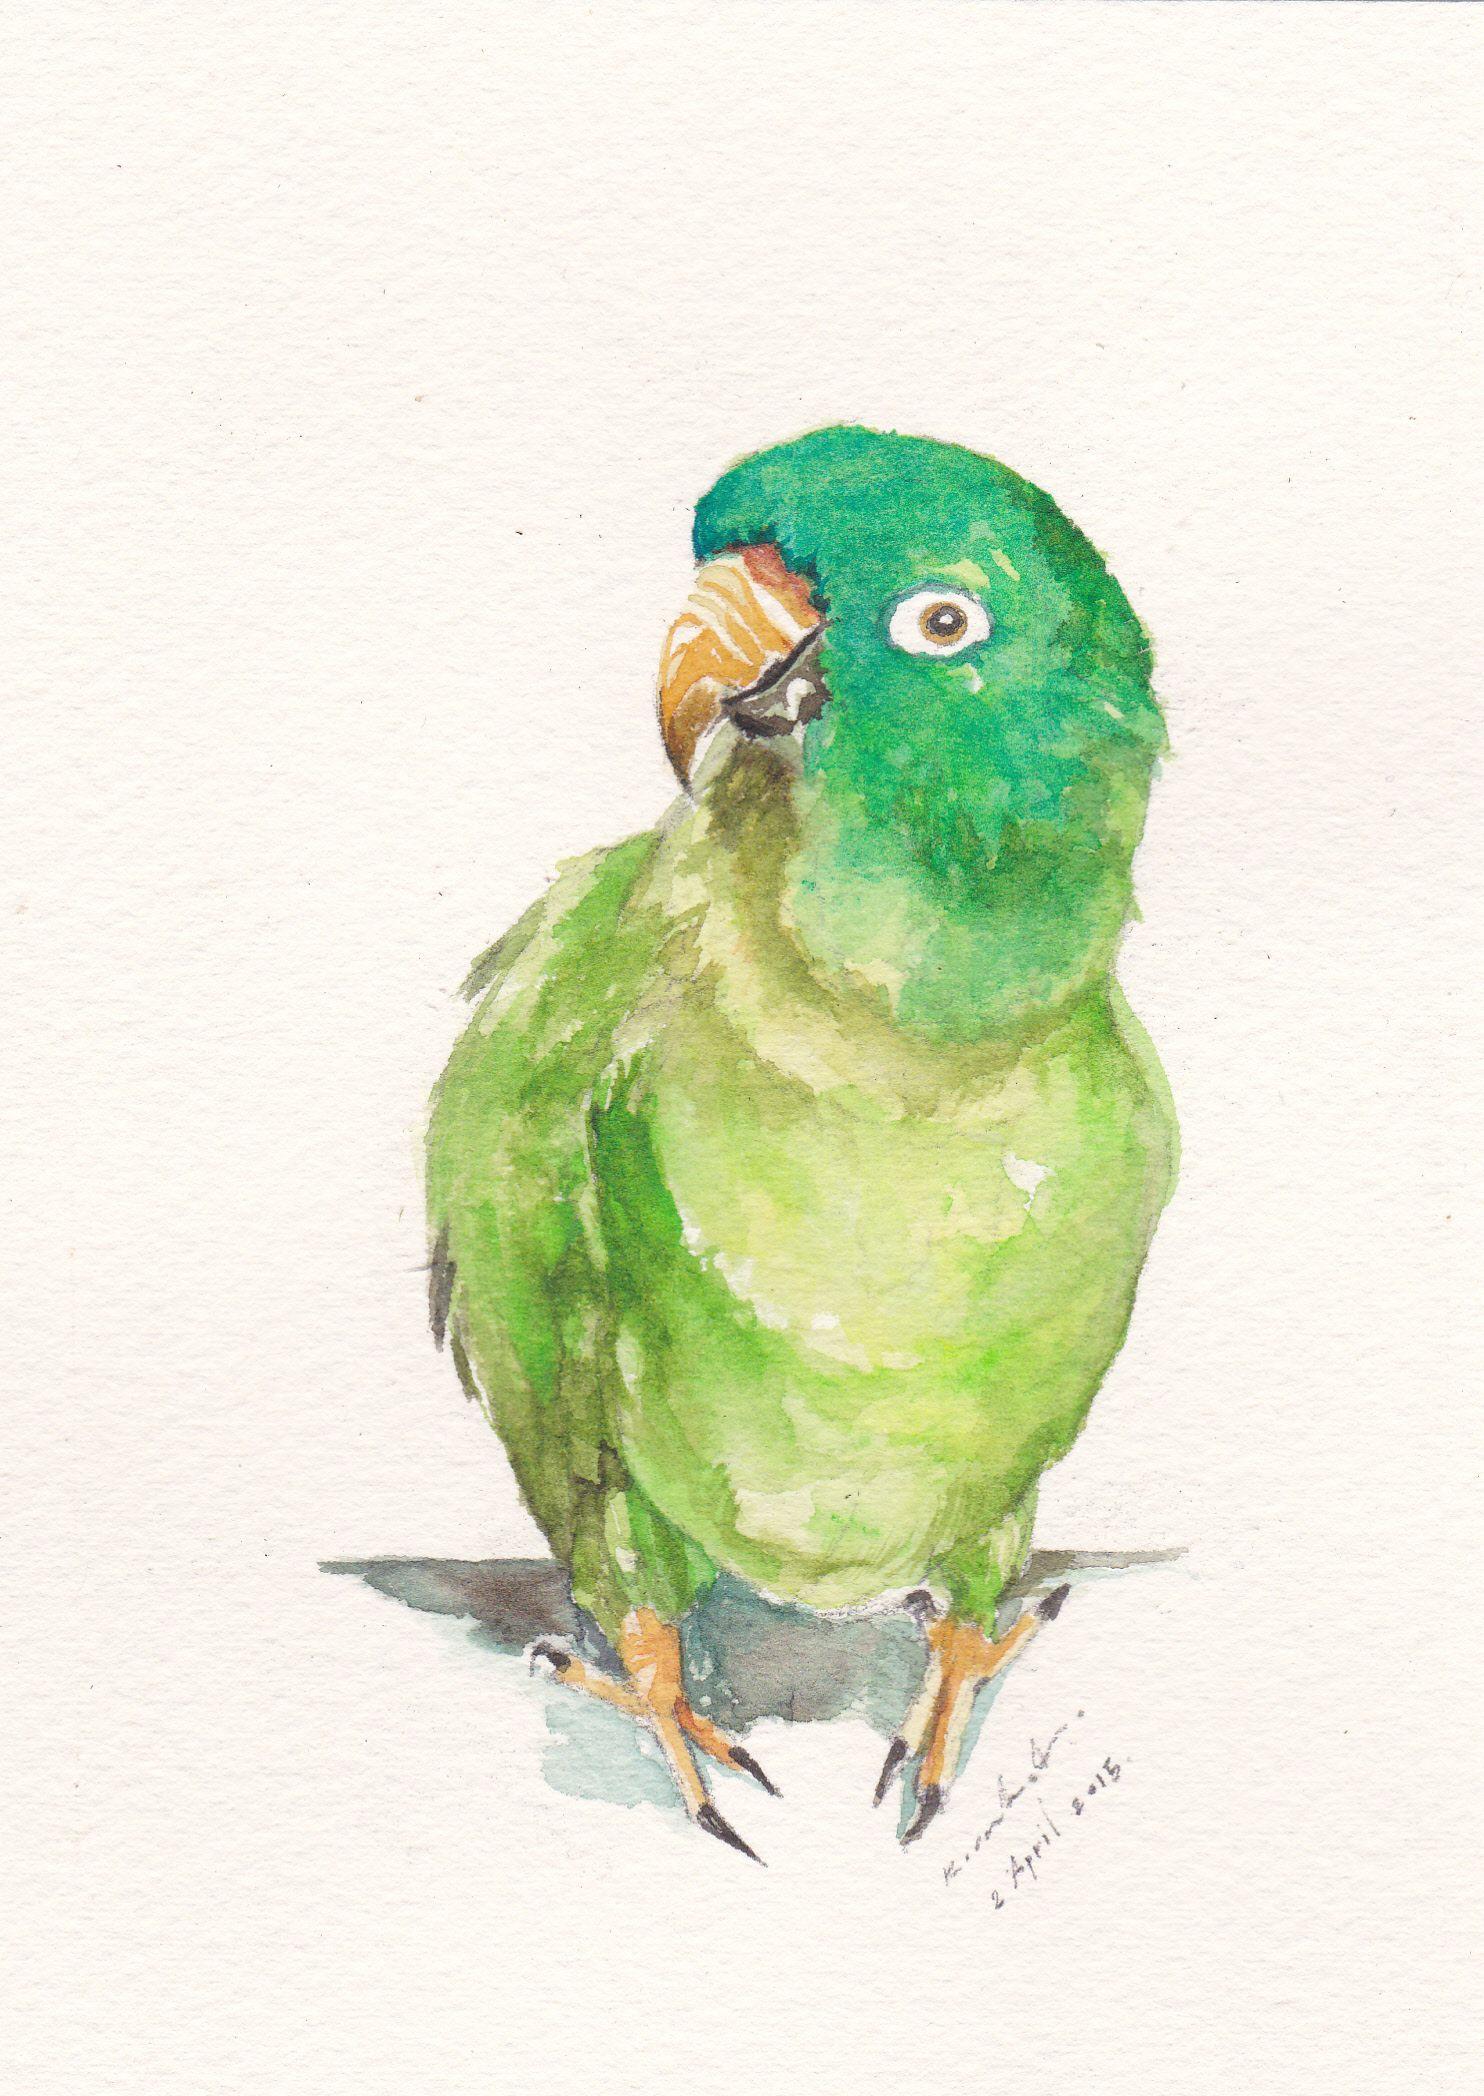 1484x2096 Original Watercolor Blue Crown Conure Parrot Httpswww.facebook